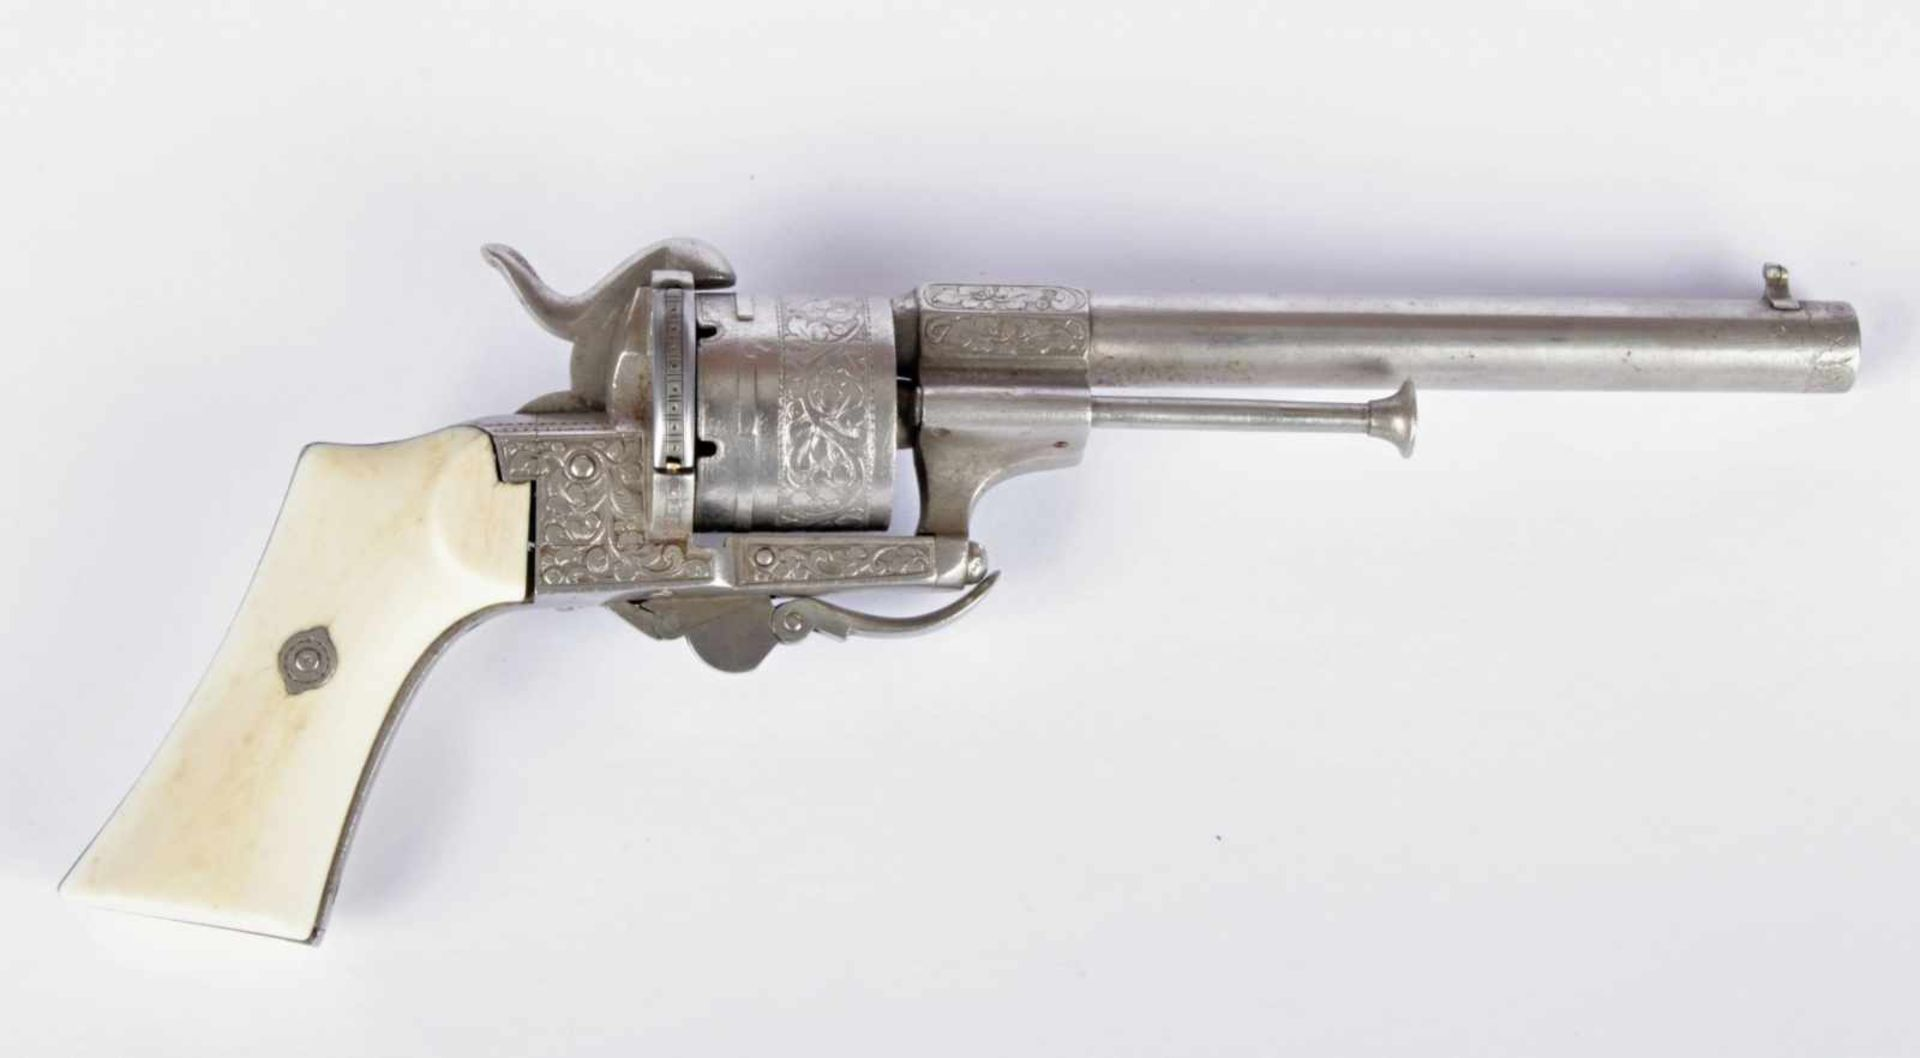 Revolver E. Lefaucheux, Brevete France, Paris, circa 1860, revolver marked E. LEFAUCHEUX / INVR